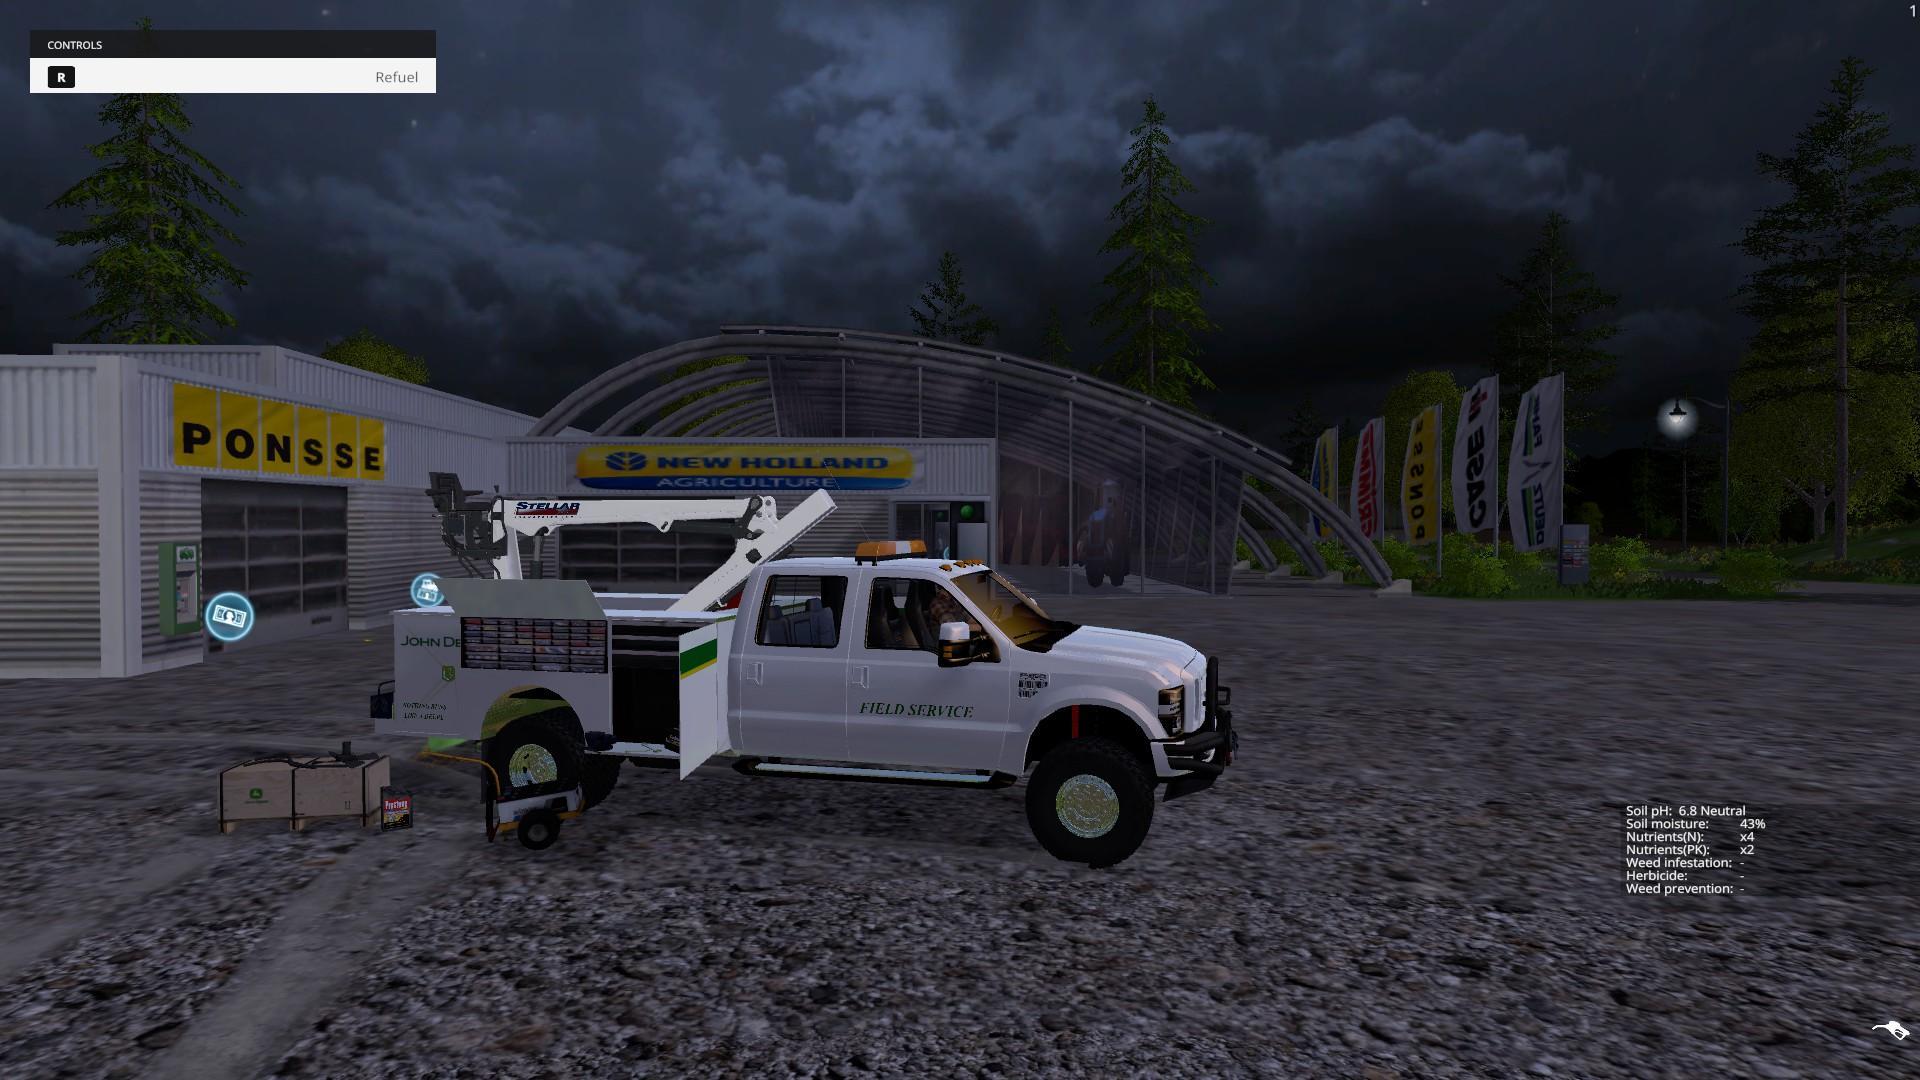 JOHN DEERE REPAIR TRUCK V3 0 • Farming simulator 19, 17, 15